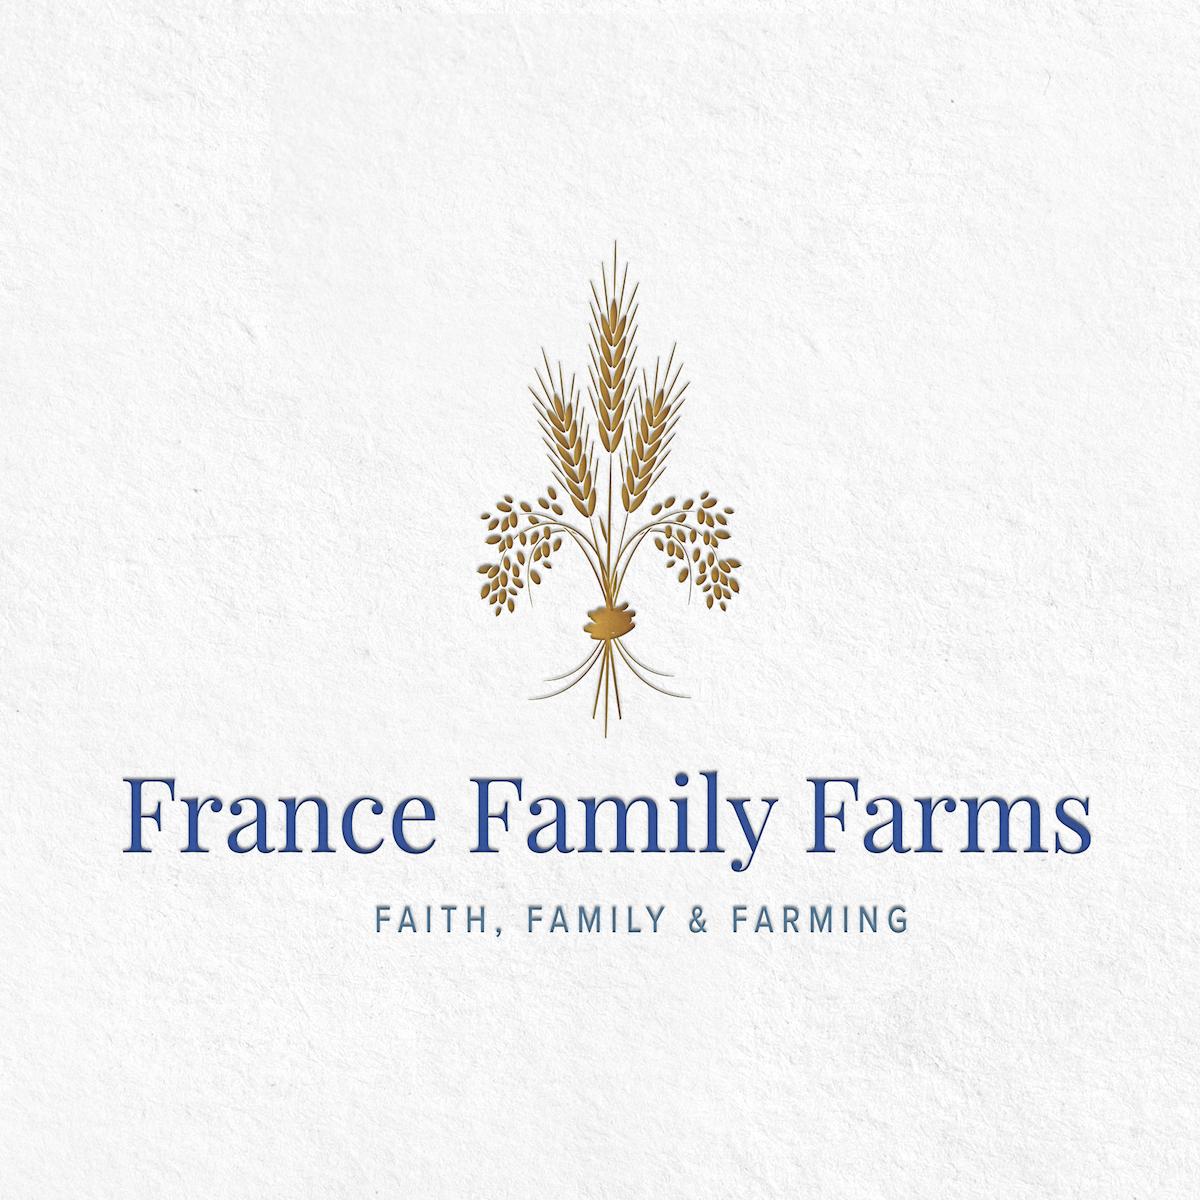 fff-logo-mockup.png